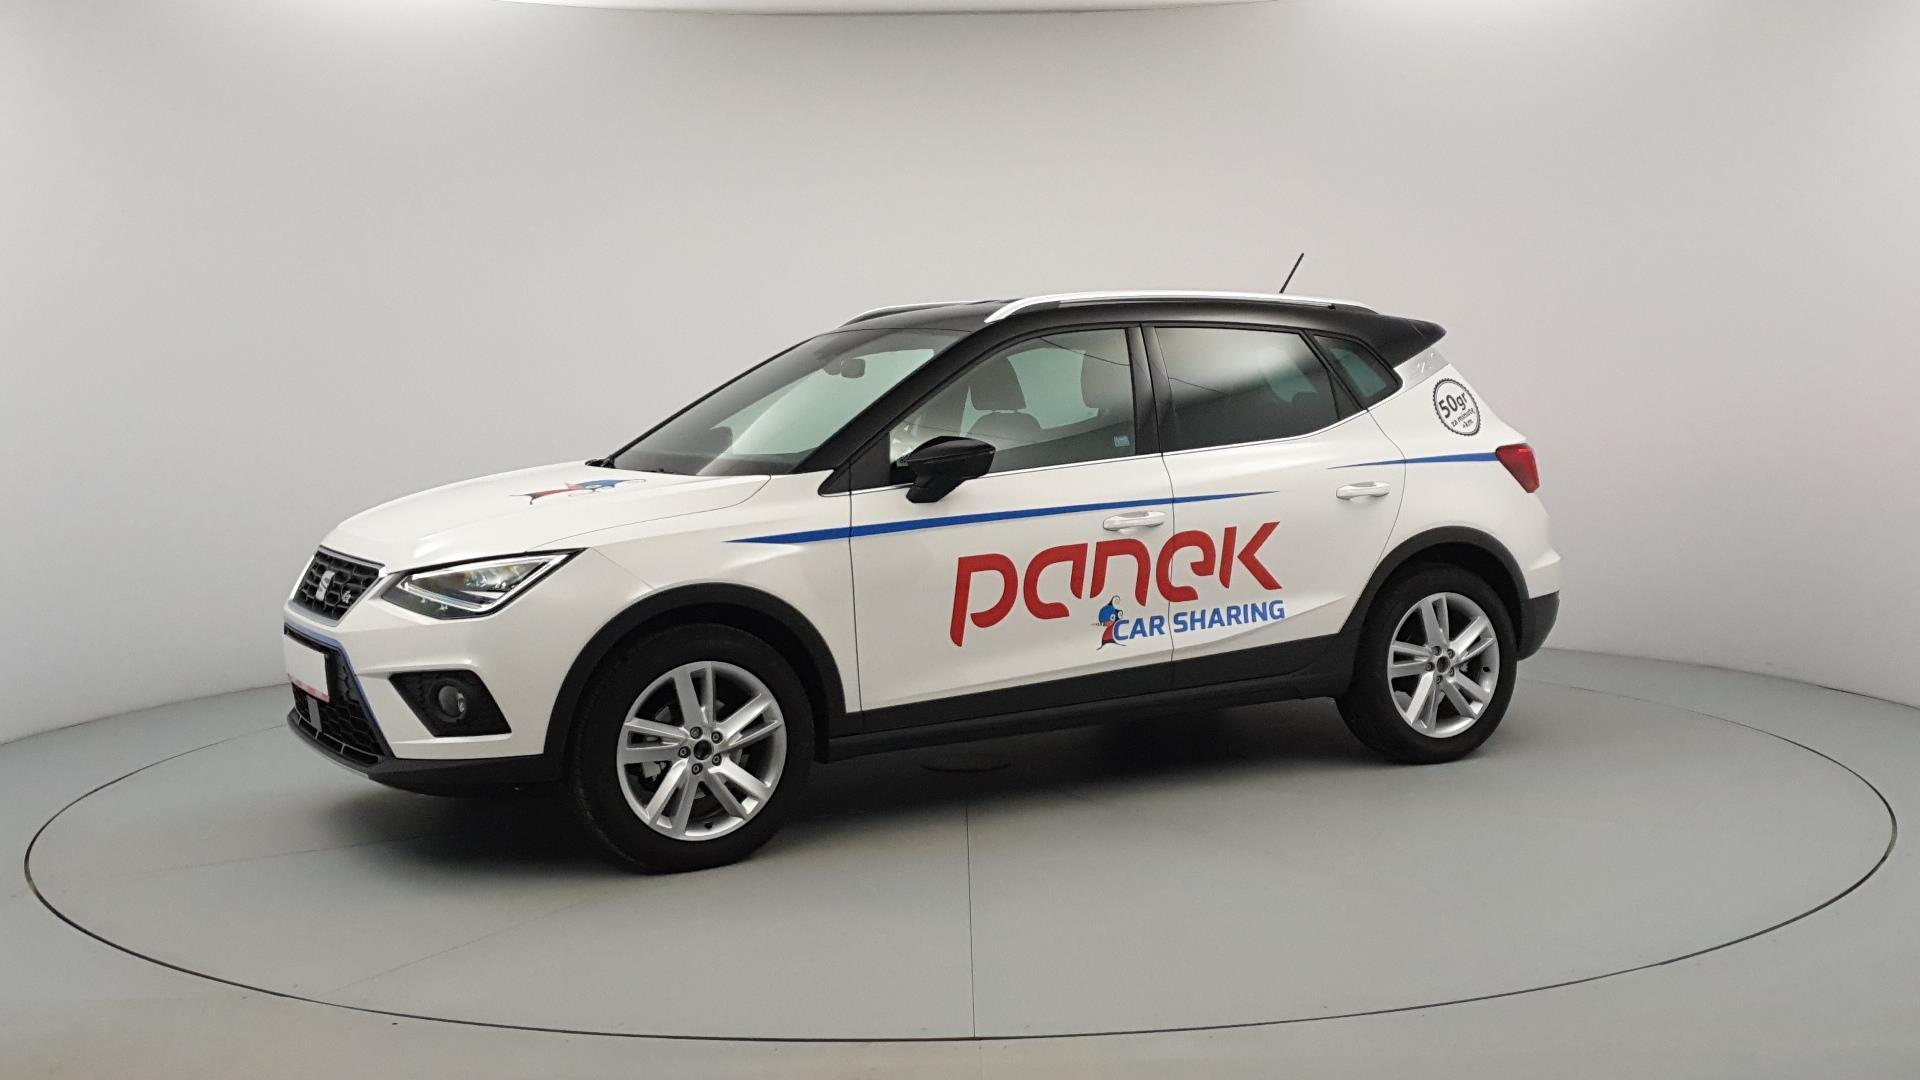 Seat Arona w Panek Carsharing